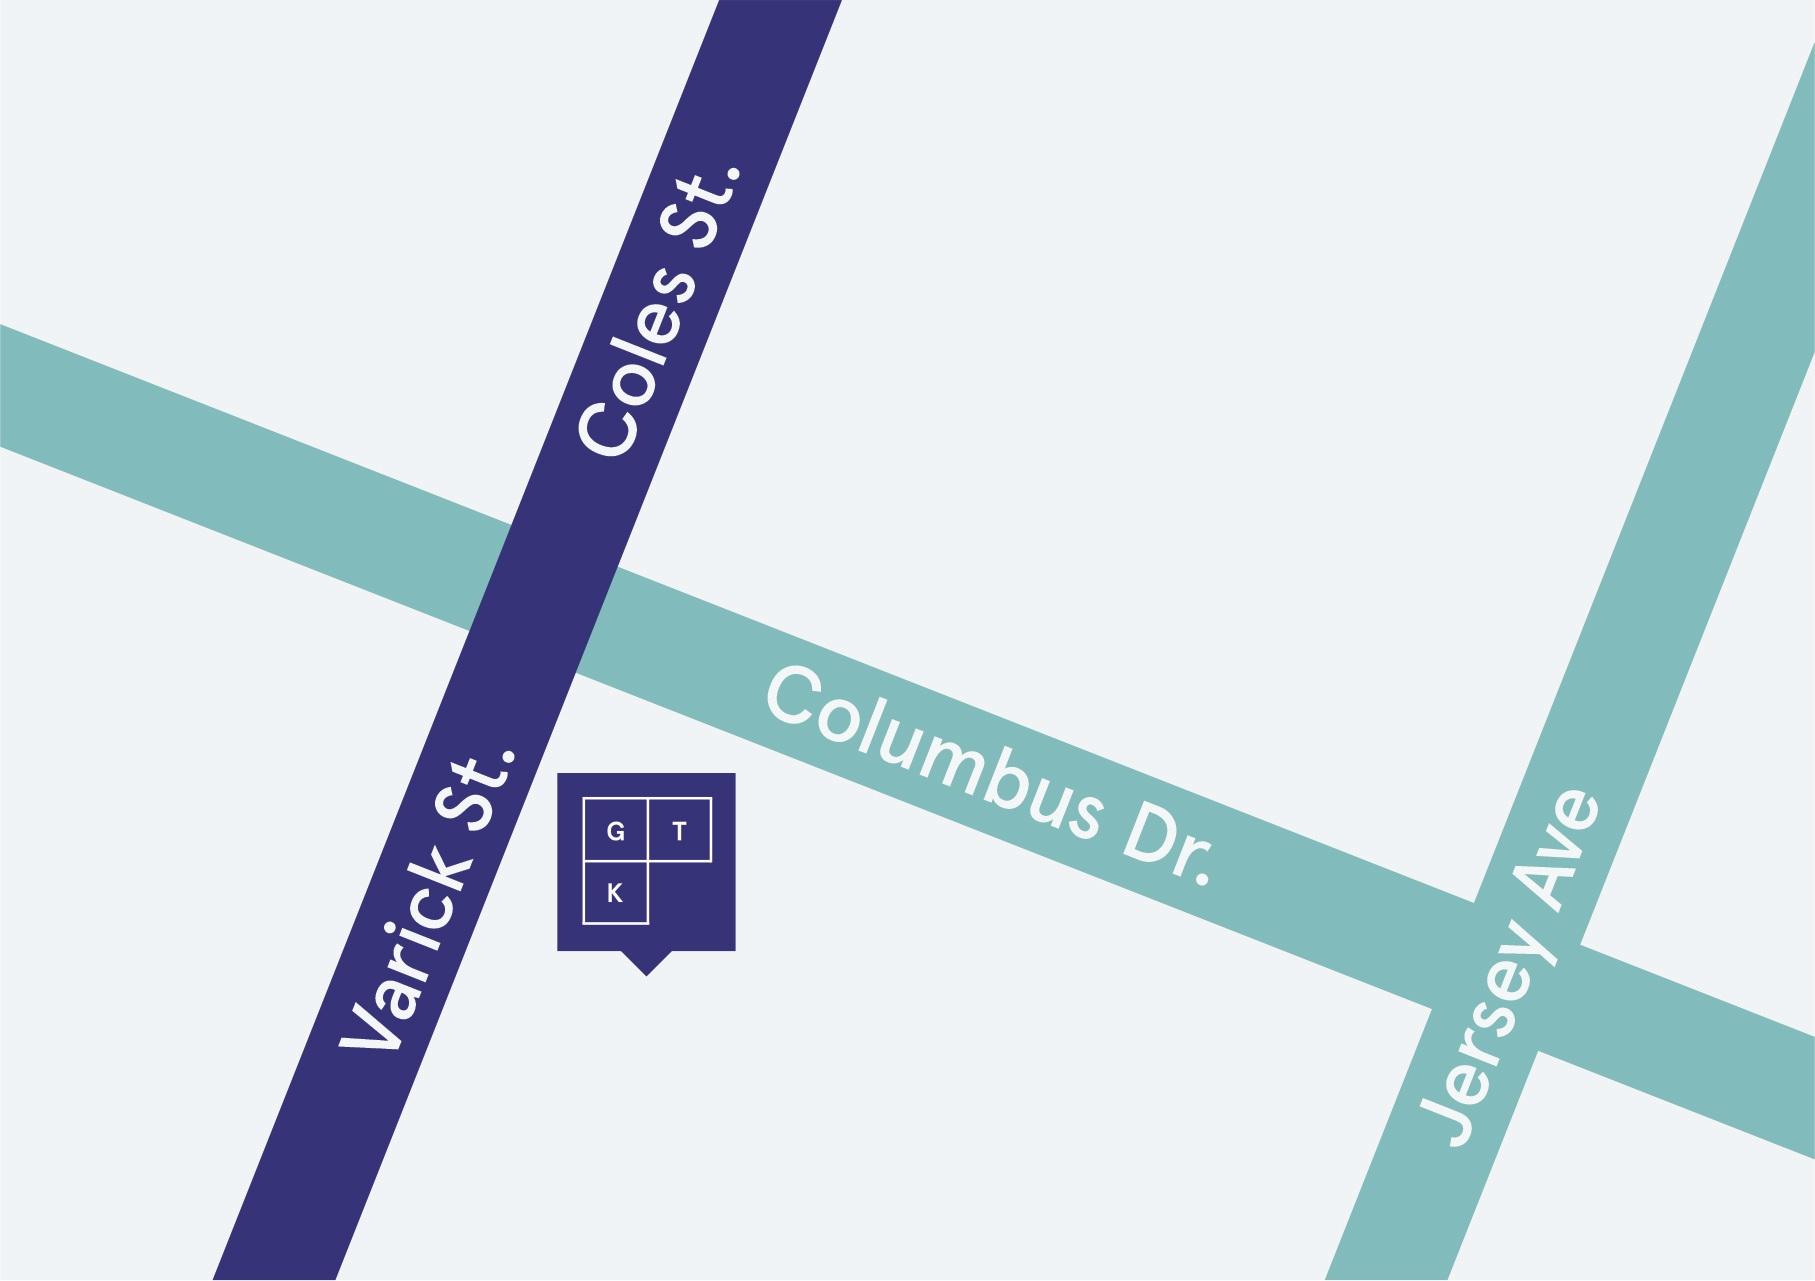 GTK-Map.jpg